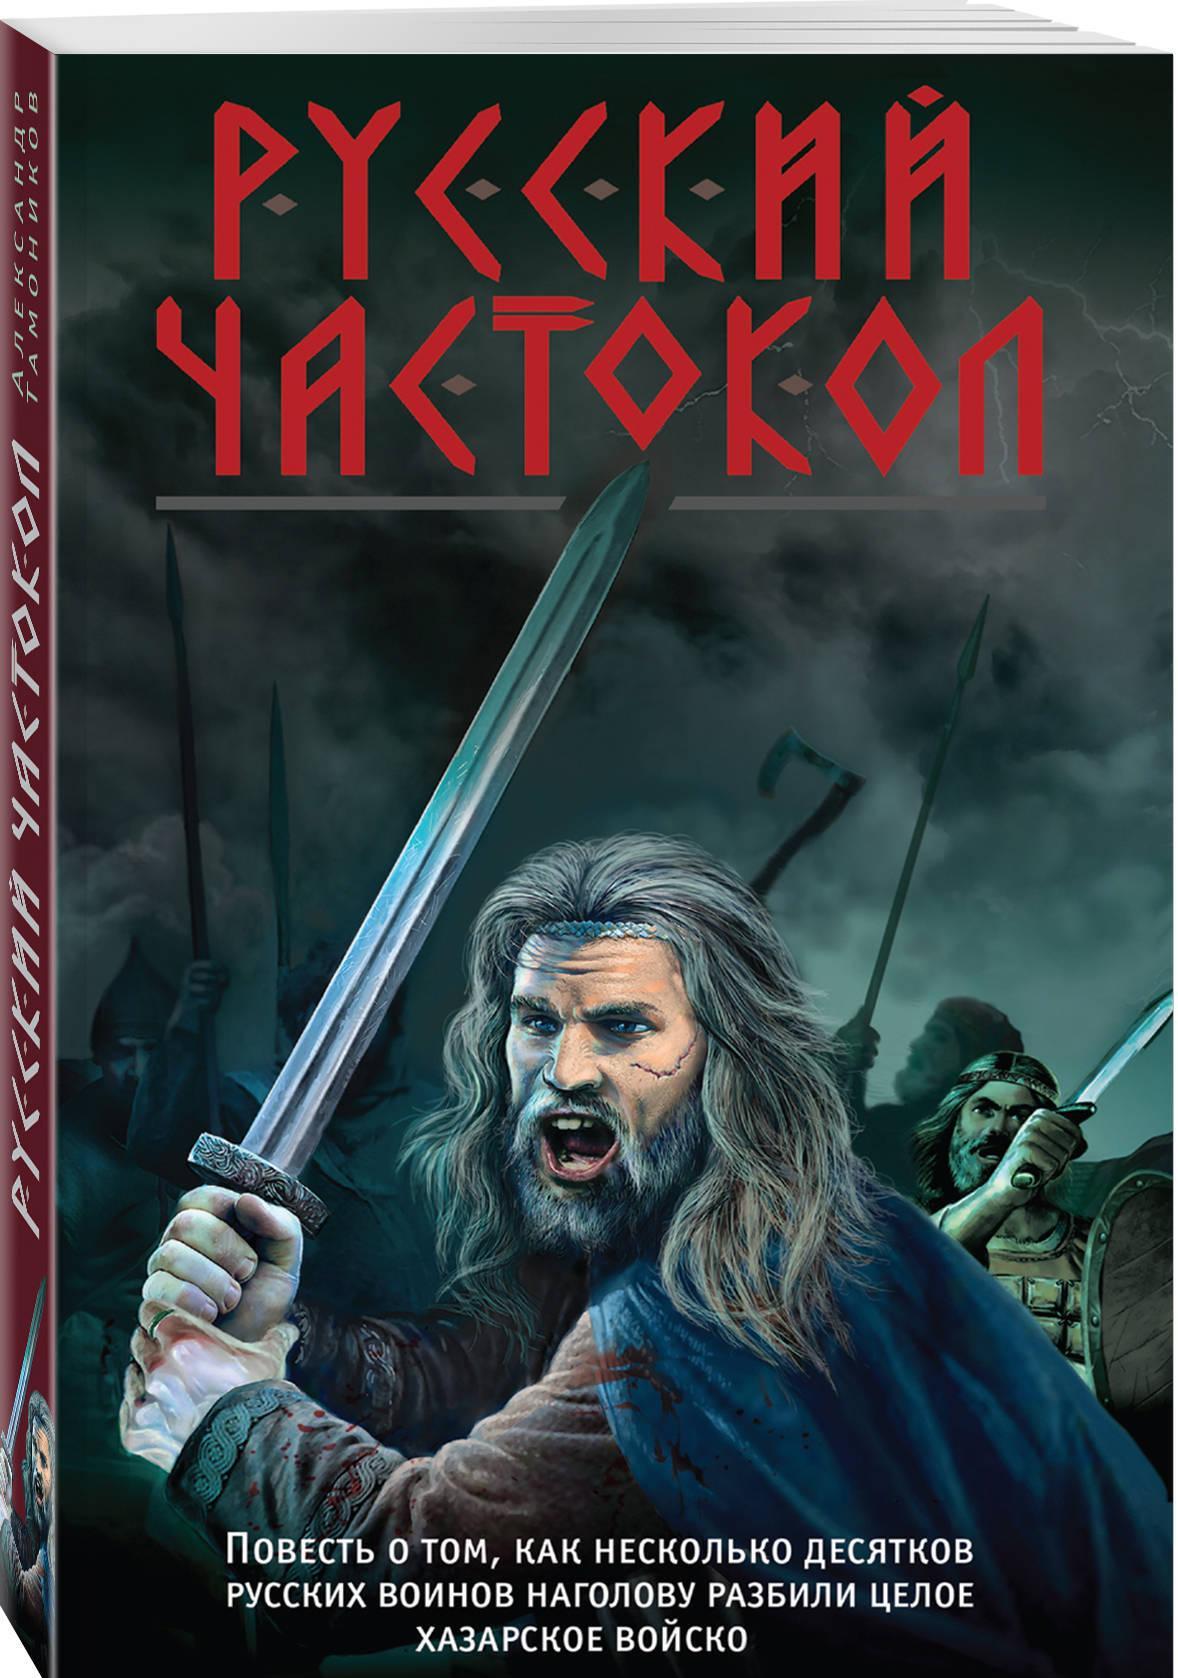 Russkij chastokol | Tamonikov Aleksandr Aleksandrovich